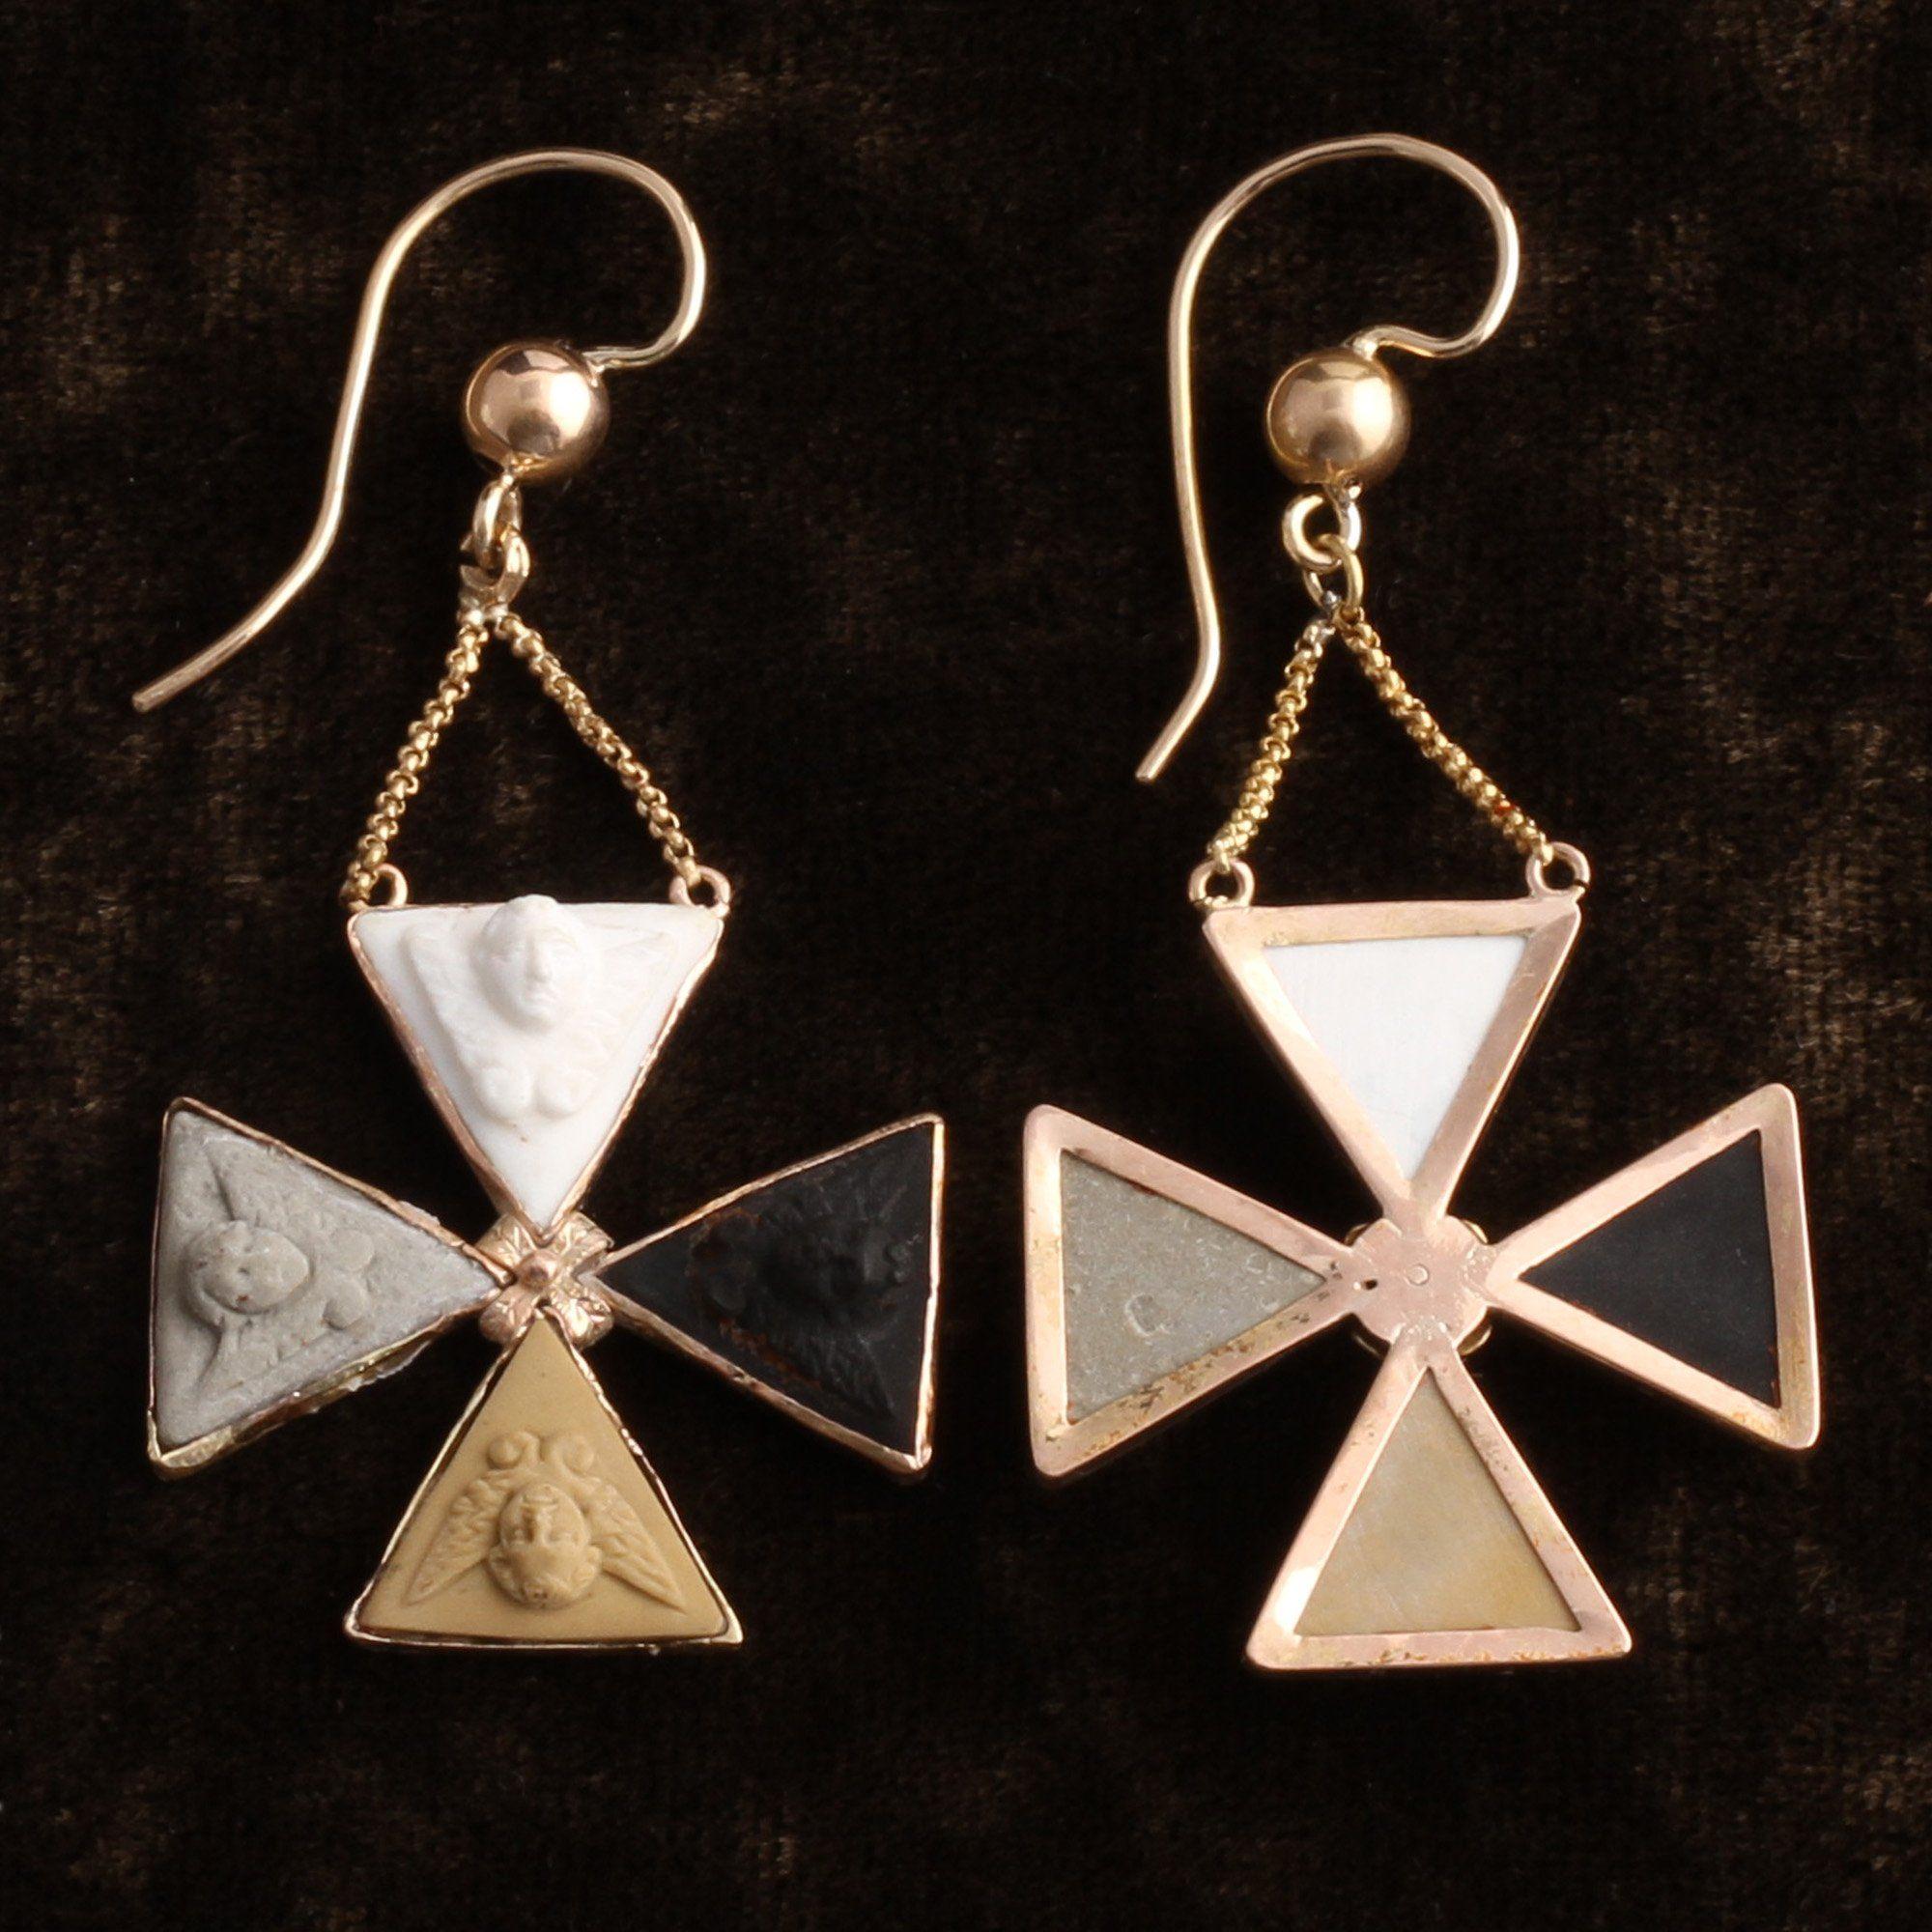 Grand Tour Maltese Cross Earrings with Lava Cameo Cherubs